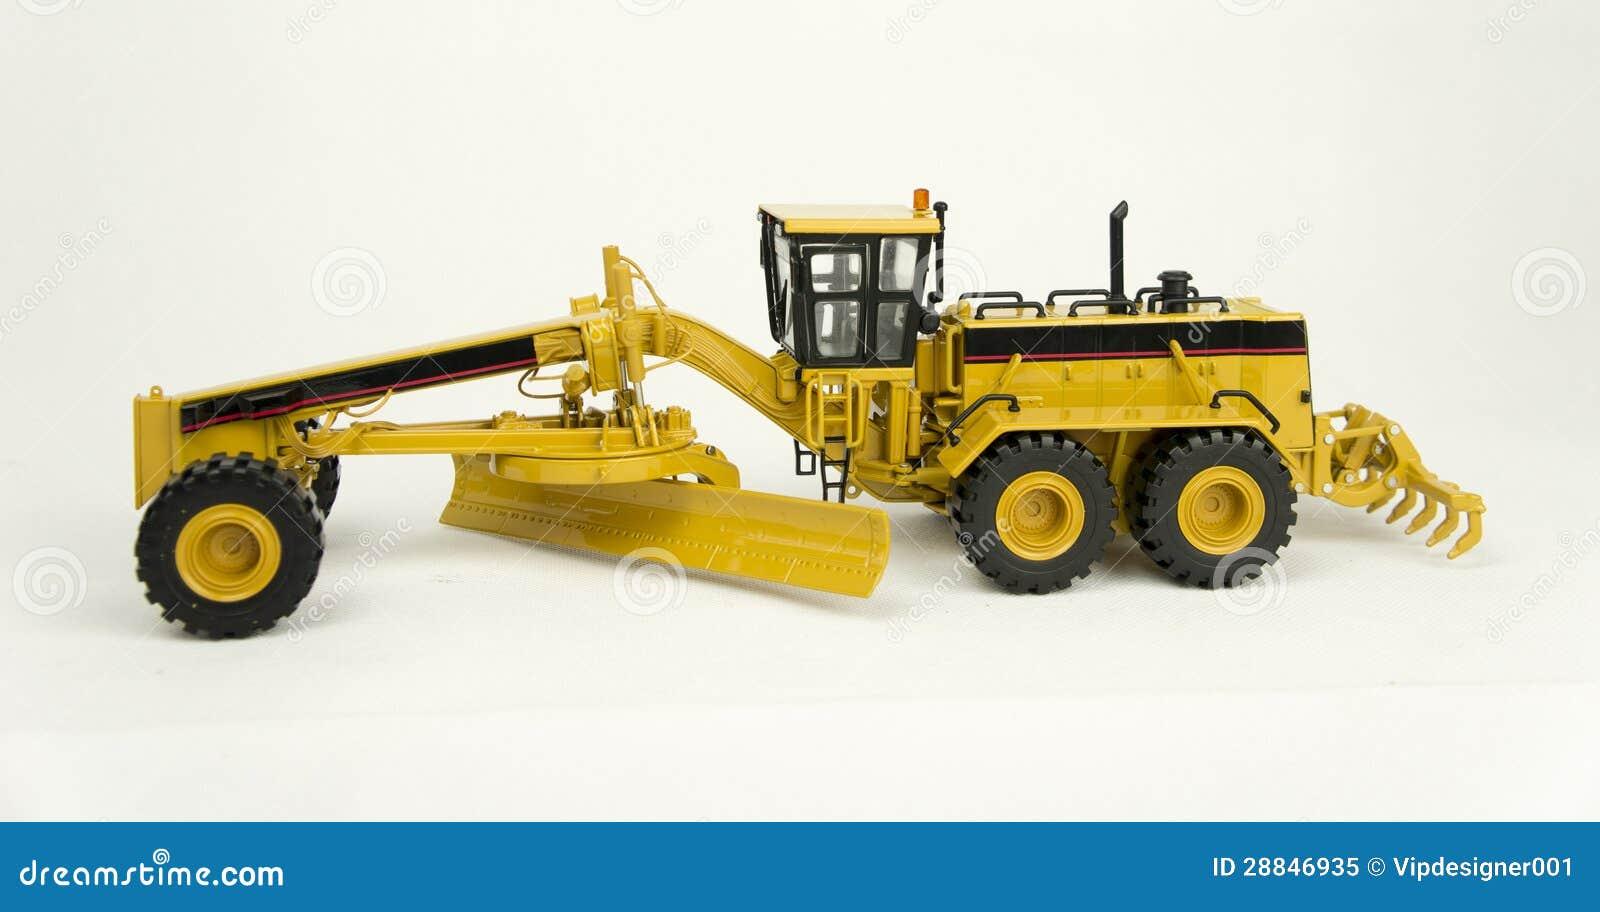 Caterpillar 24h motor grader model stock image image of for Cat 24h motor grader